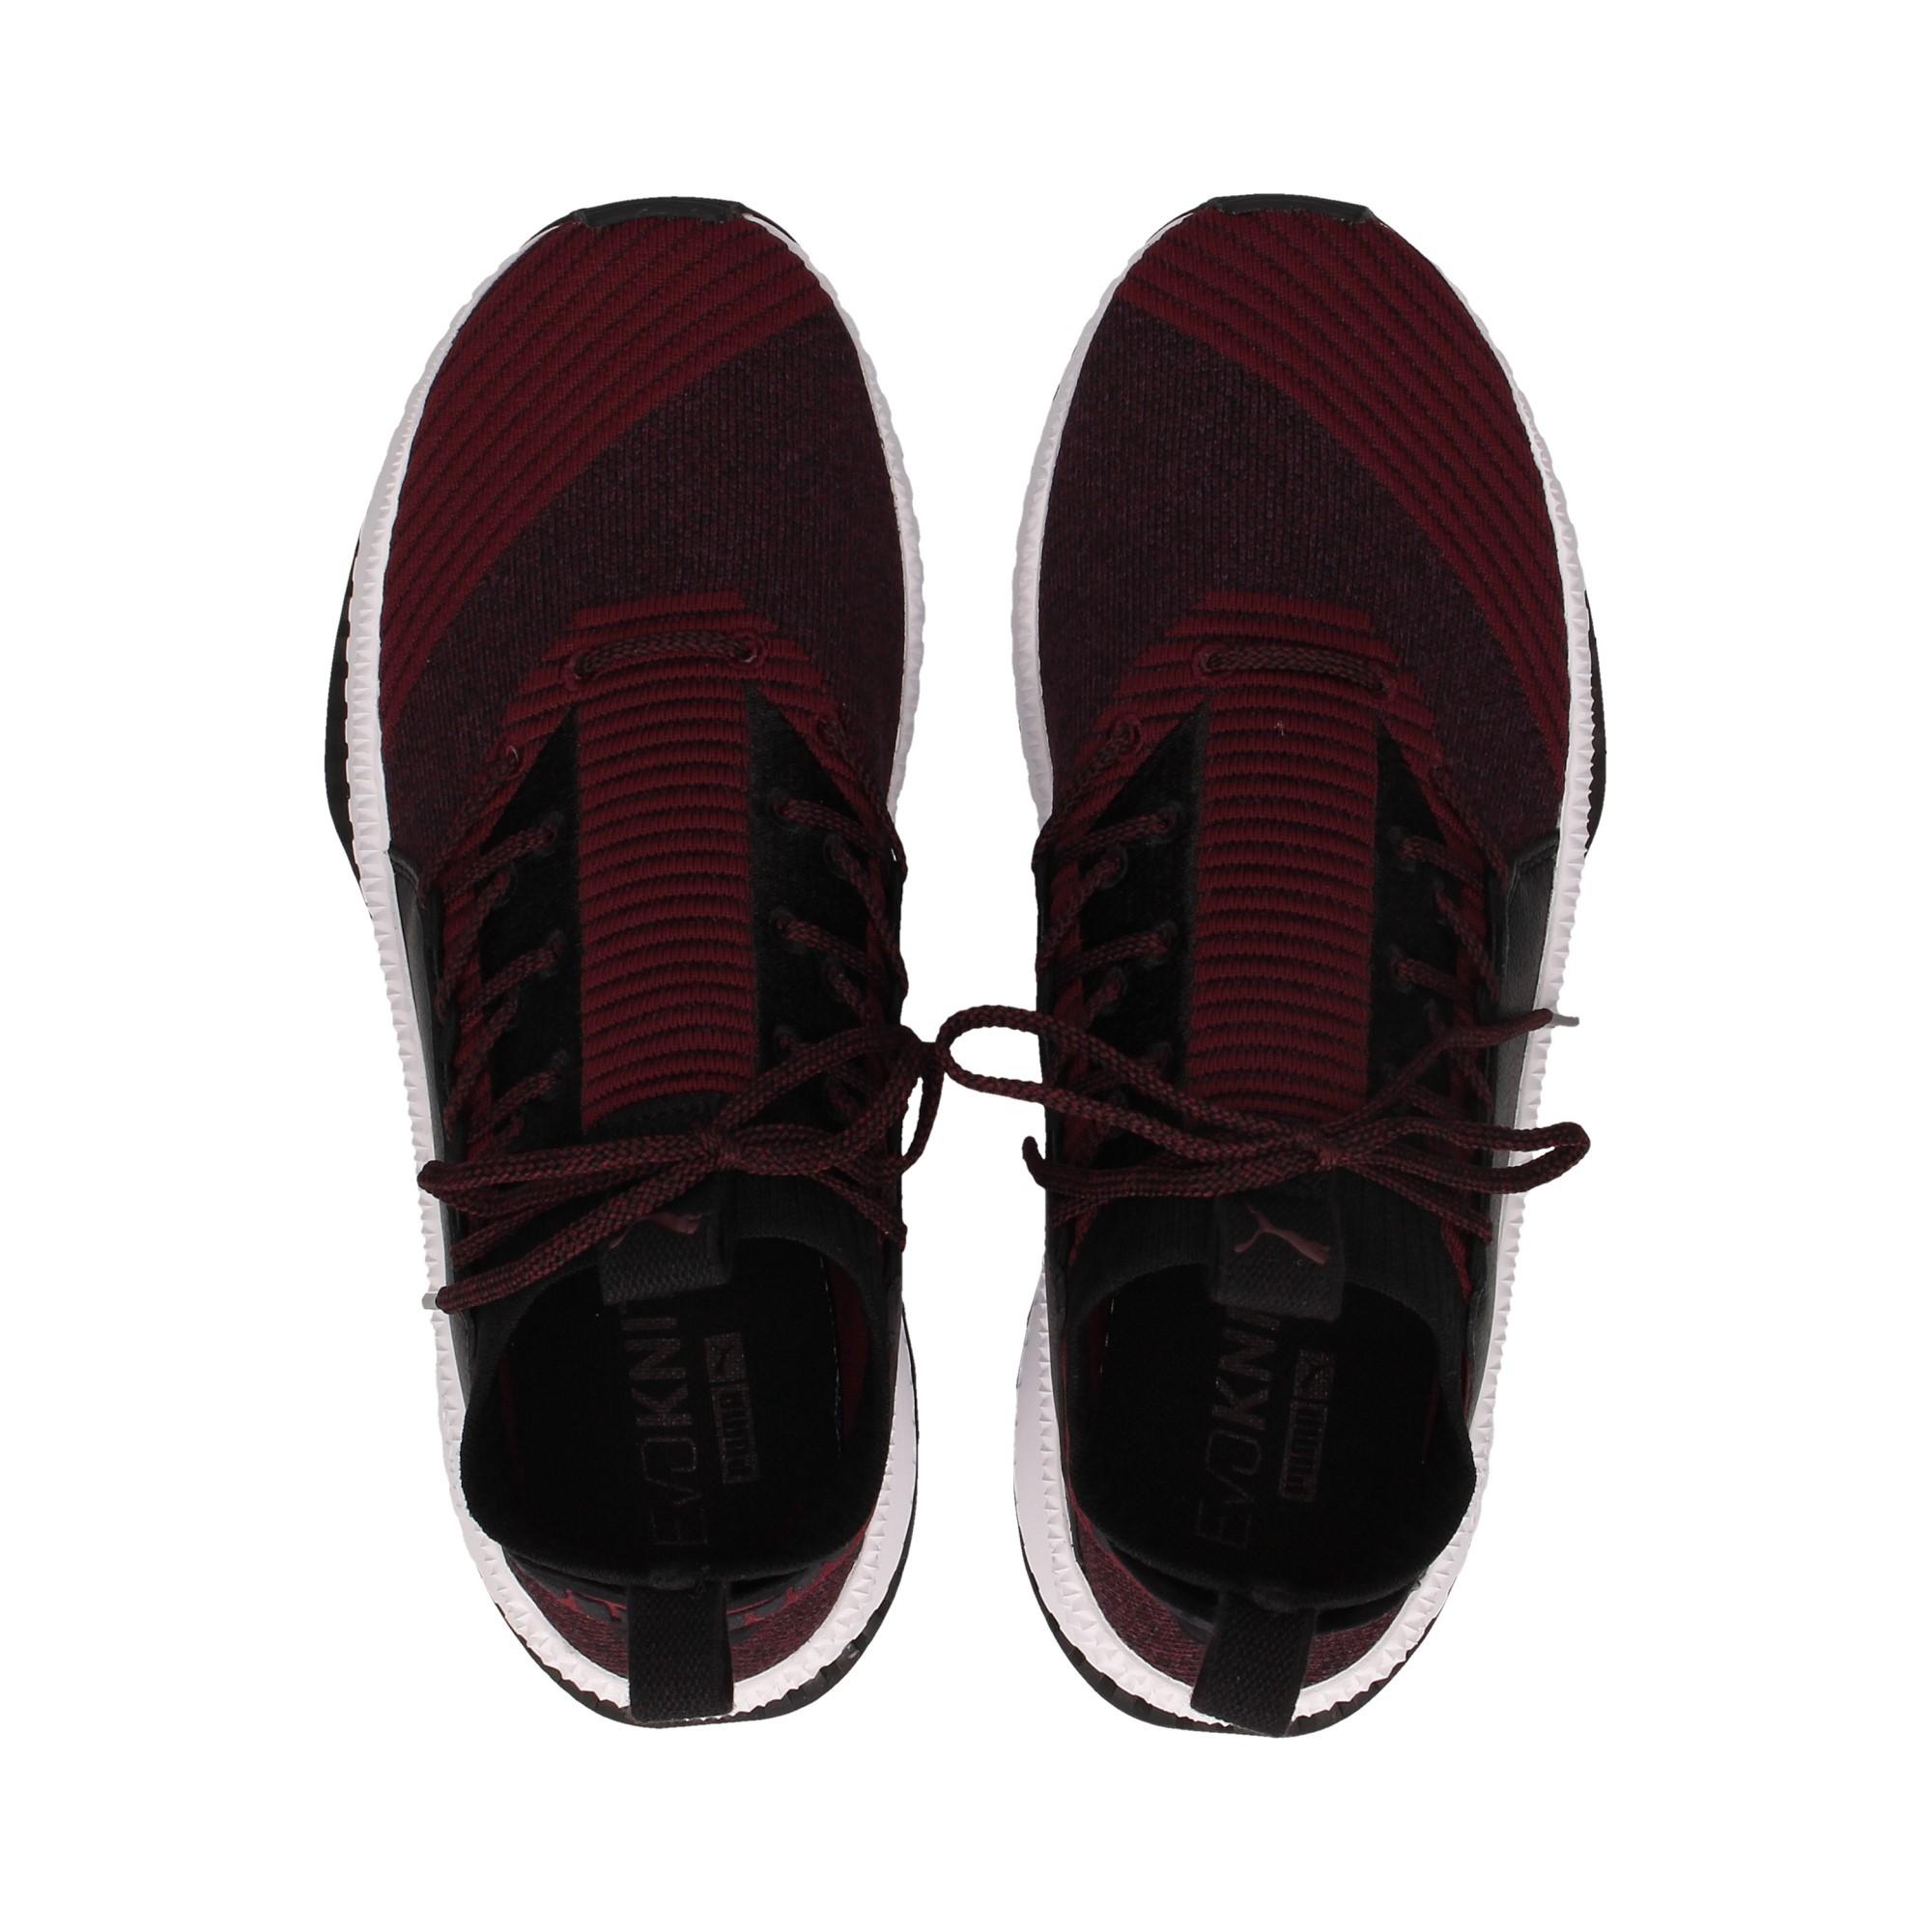 deportivo-calcetin-negro-violeta